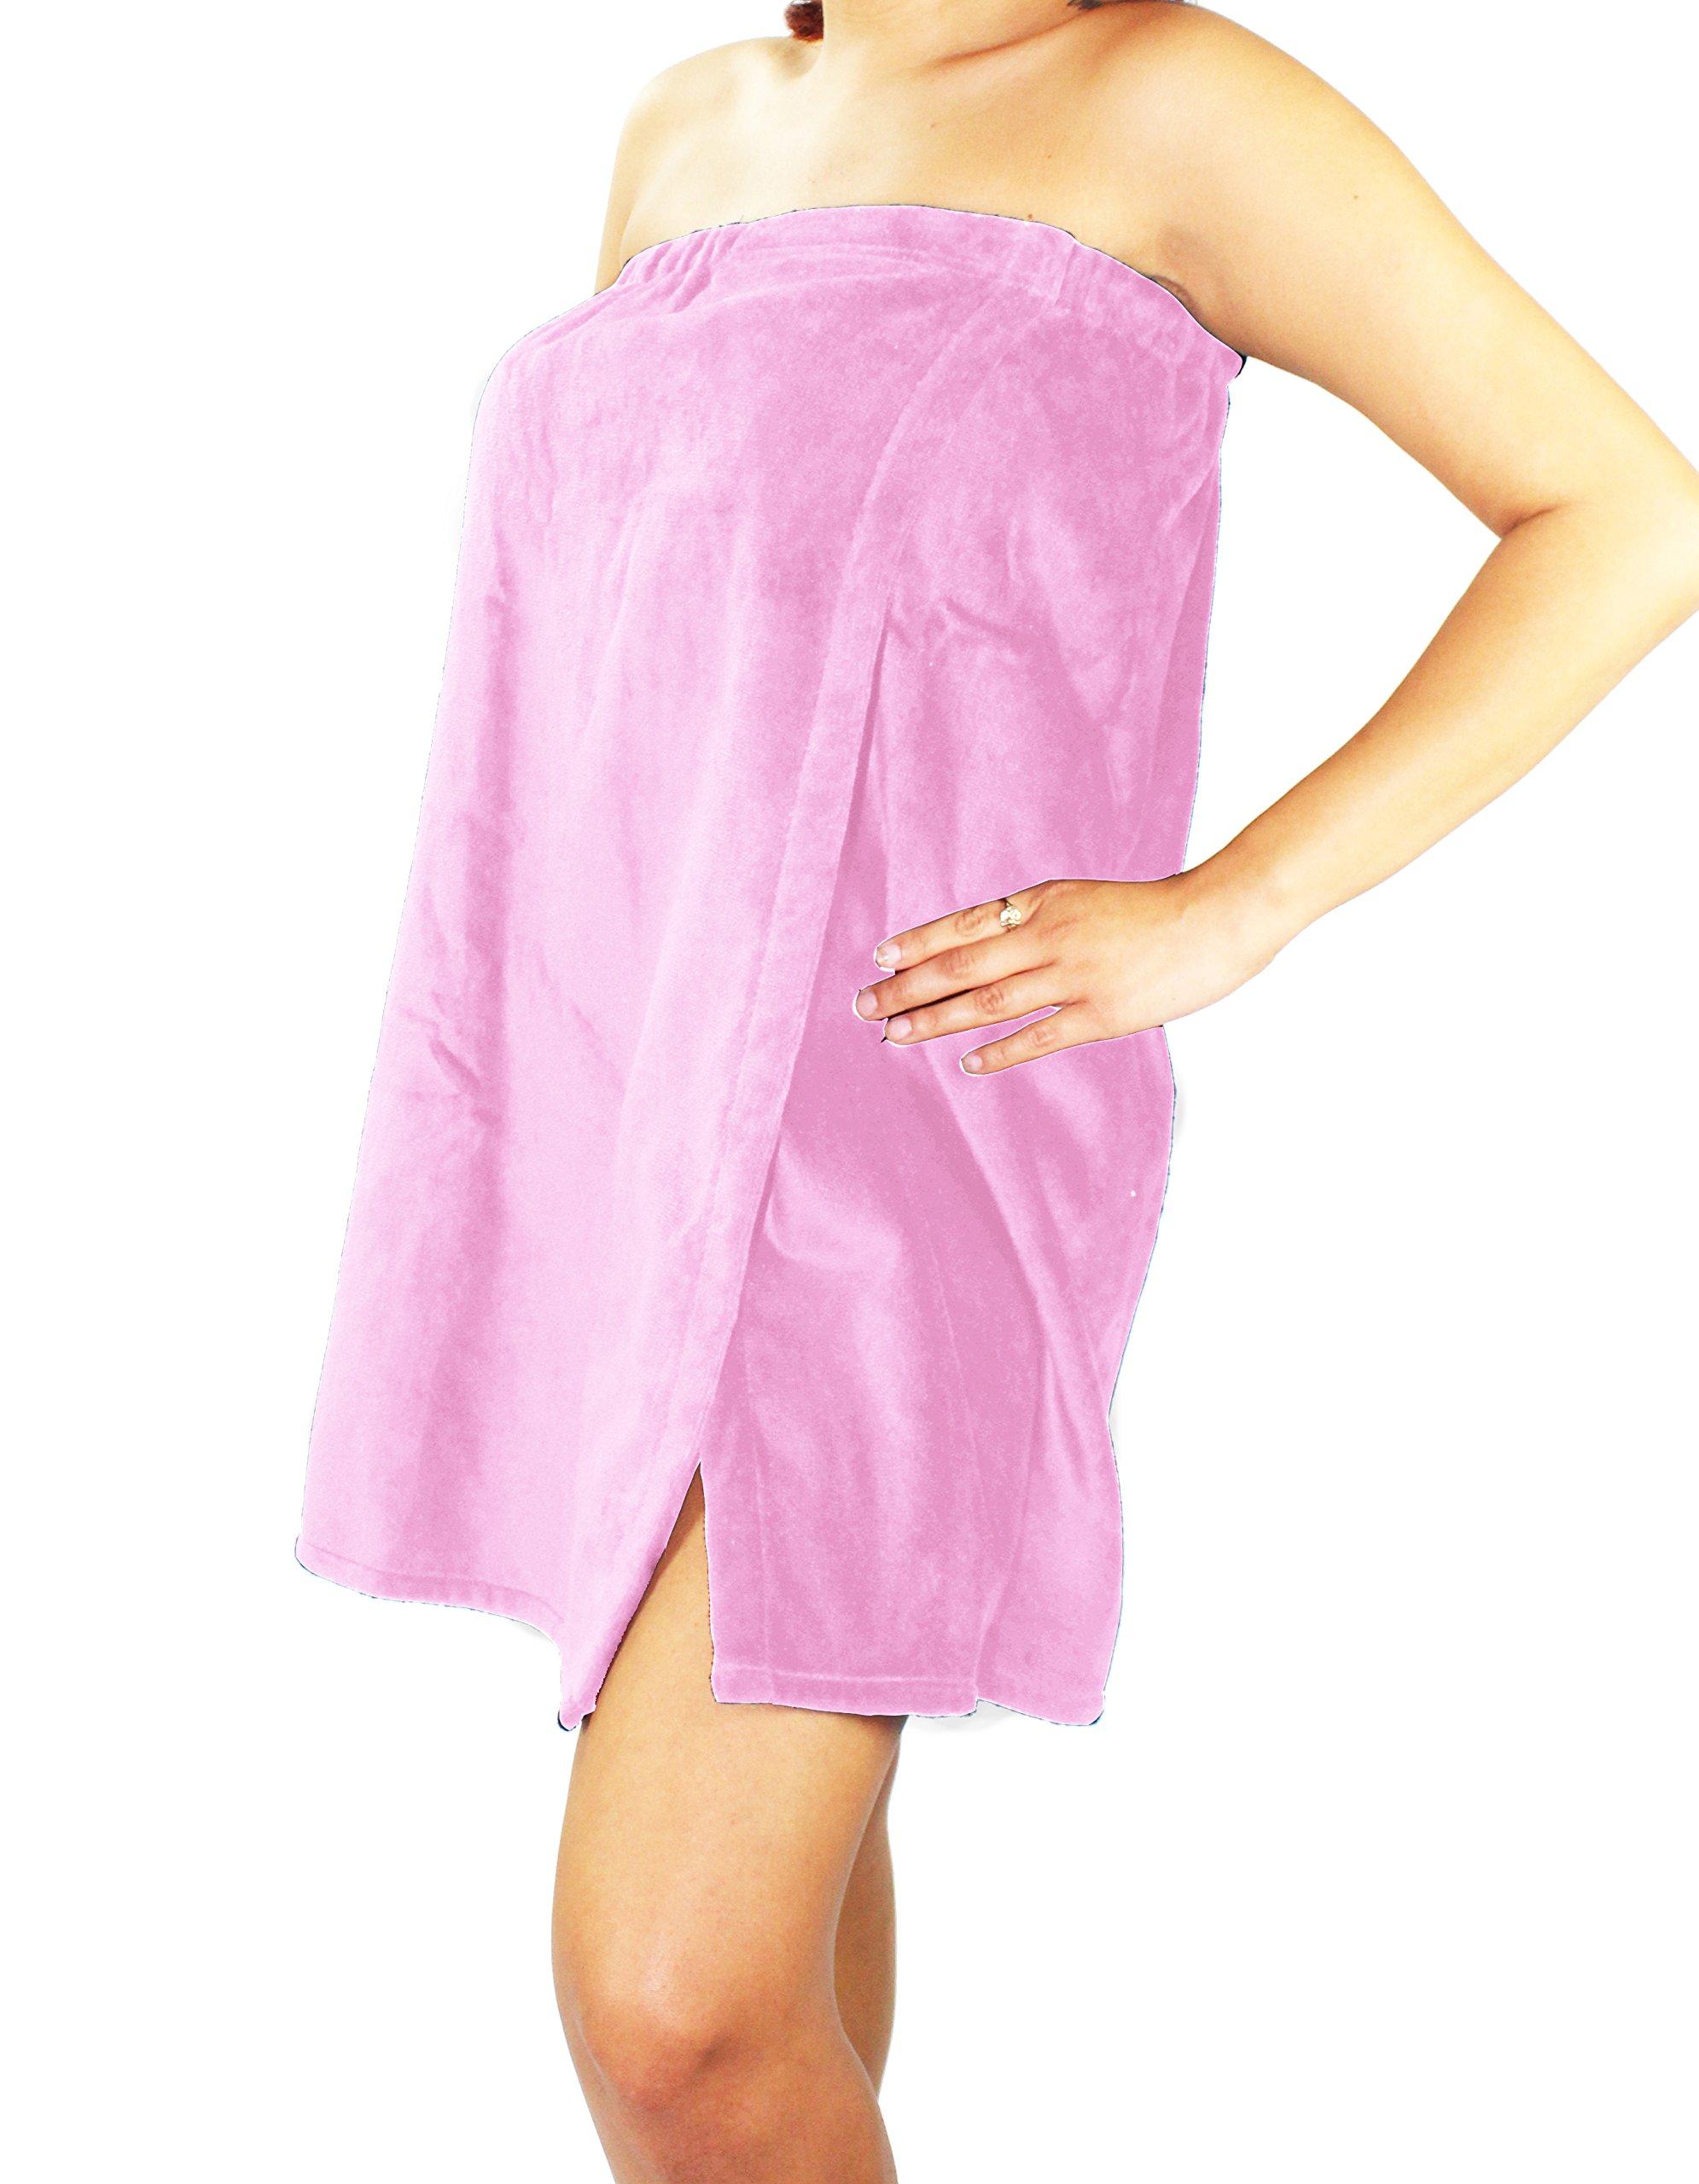 Sanders Classics 25'' Terry Towel Wrap - Light Pink